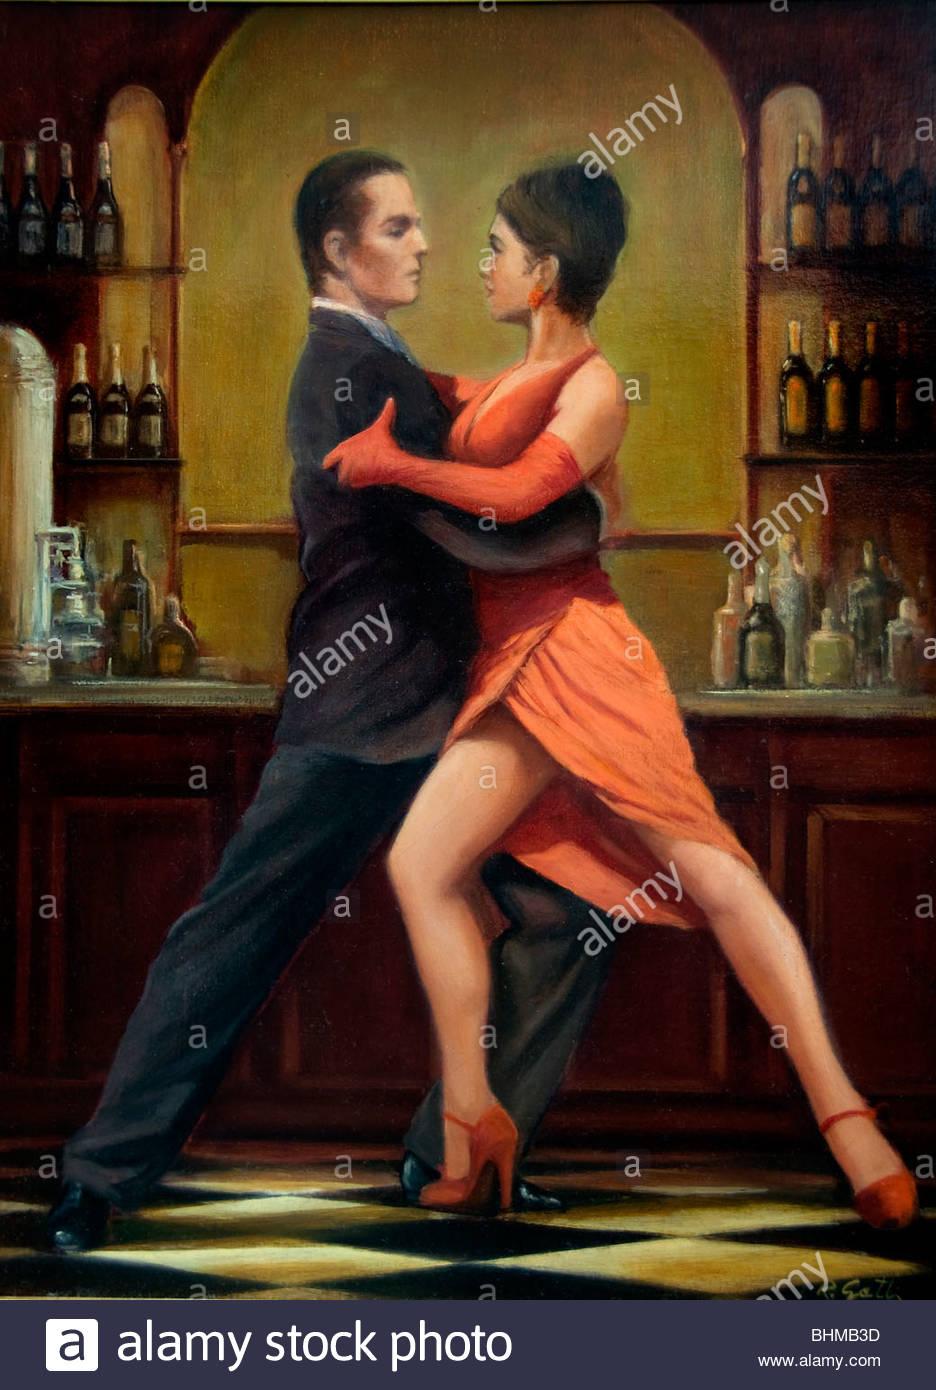 Tango Buenos Aires Argentina La Boca El Caminito segno Street Painting Foto Stock